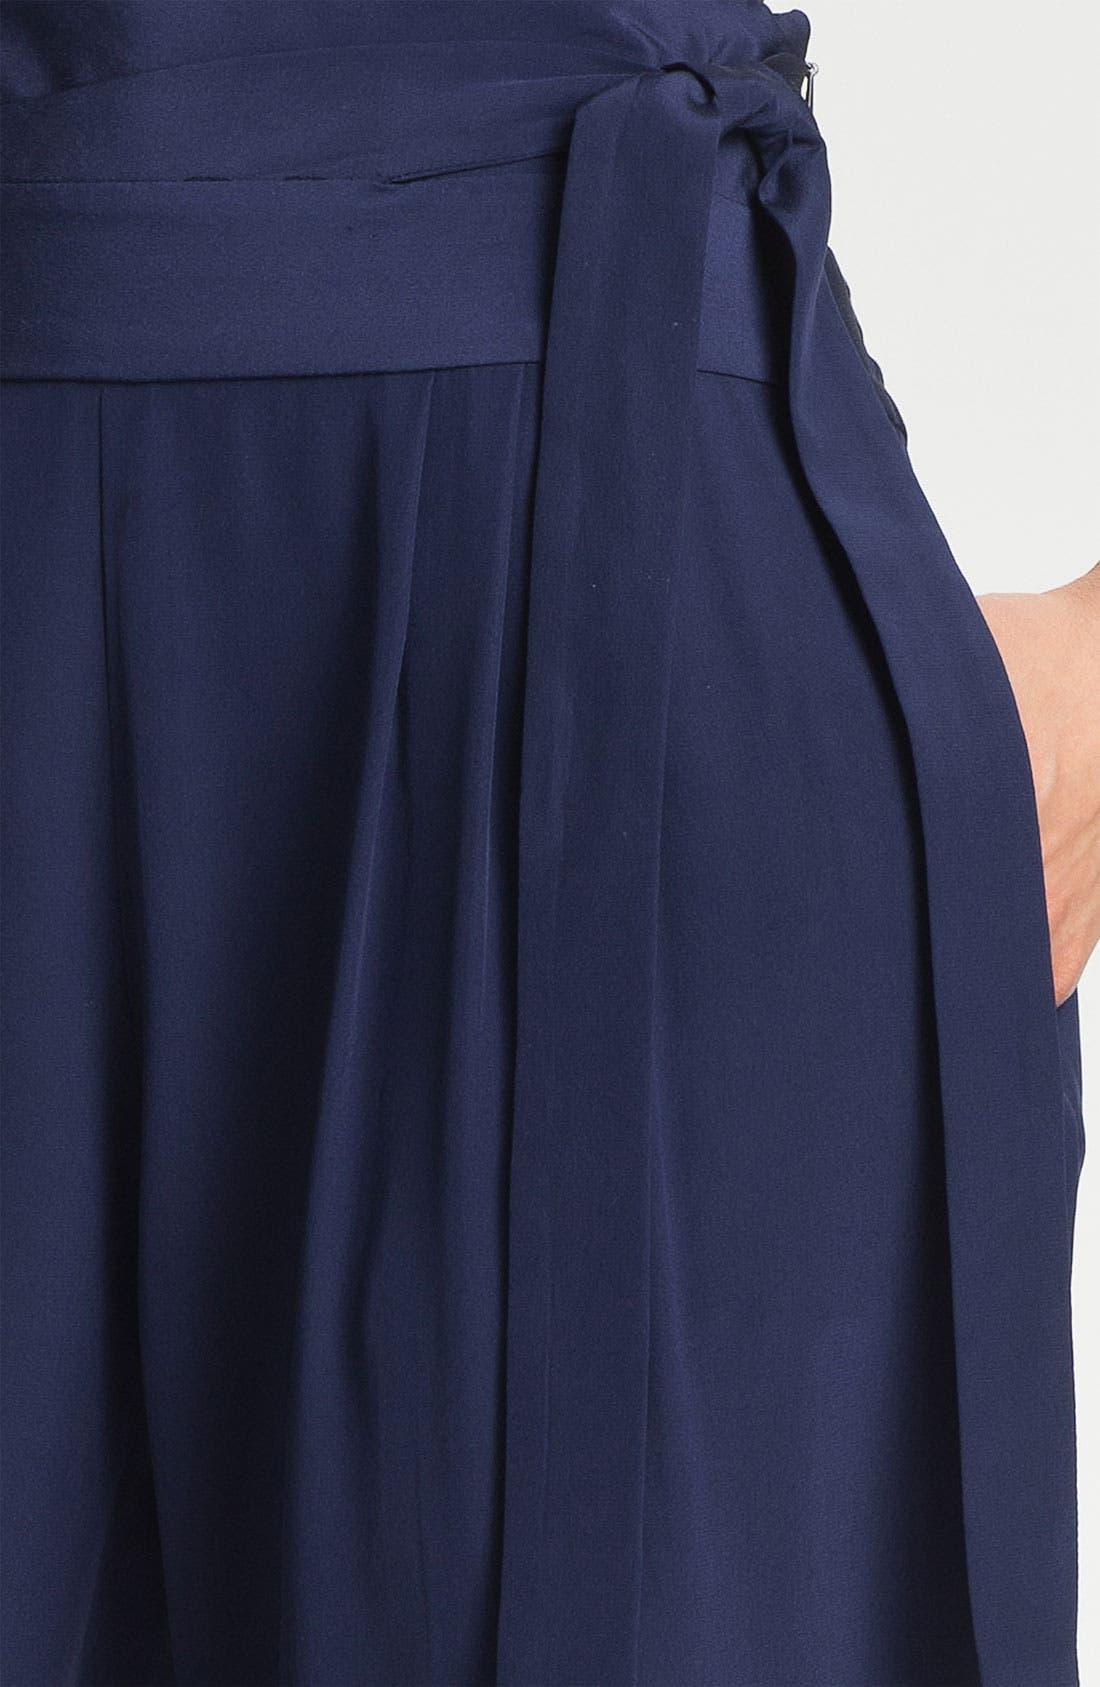 Alternate Image 3  - Diane von Furstenberg 'Keaka' Silk Capri Pants